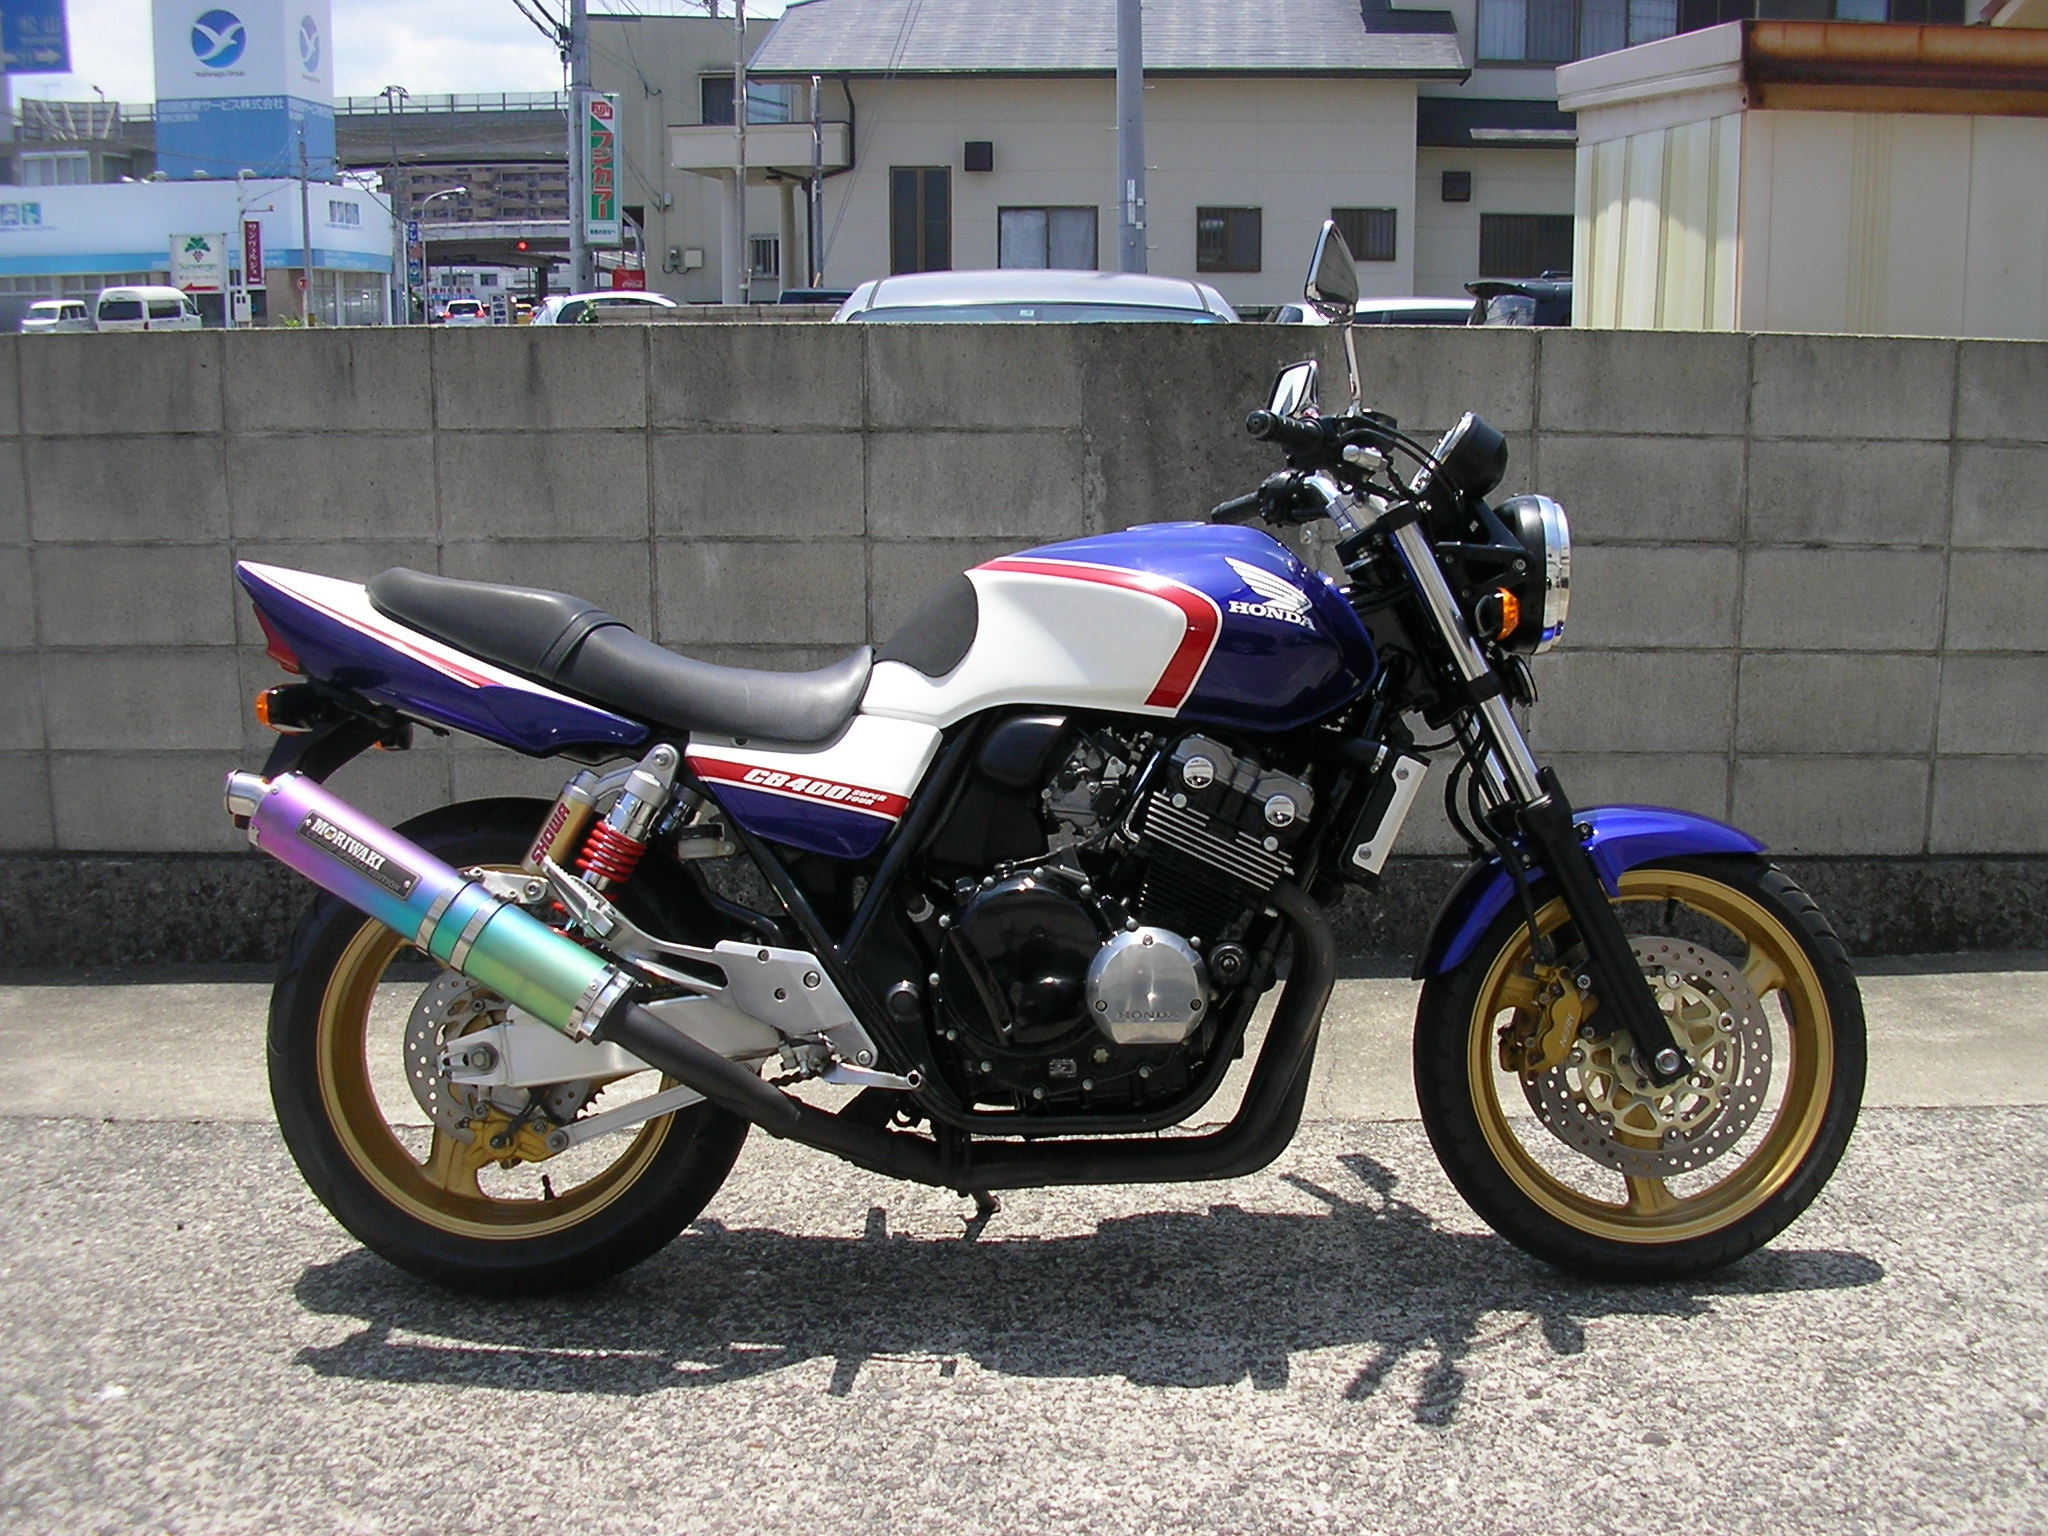 CB400SF VTEC2 (FC-000) - 【公式】レンタルバイクのベストBike® 五条大宮駅前